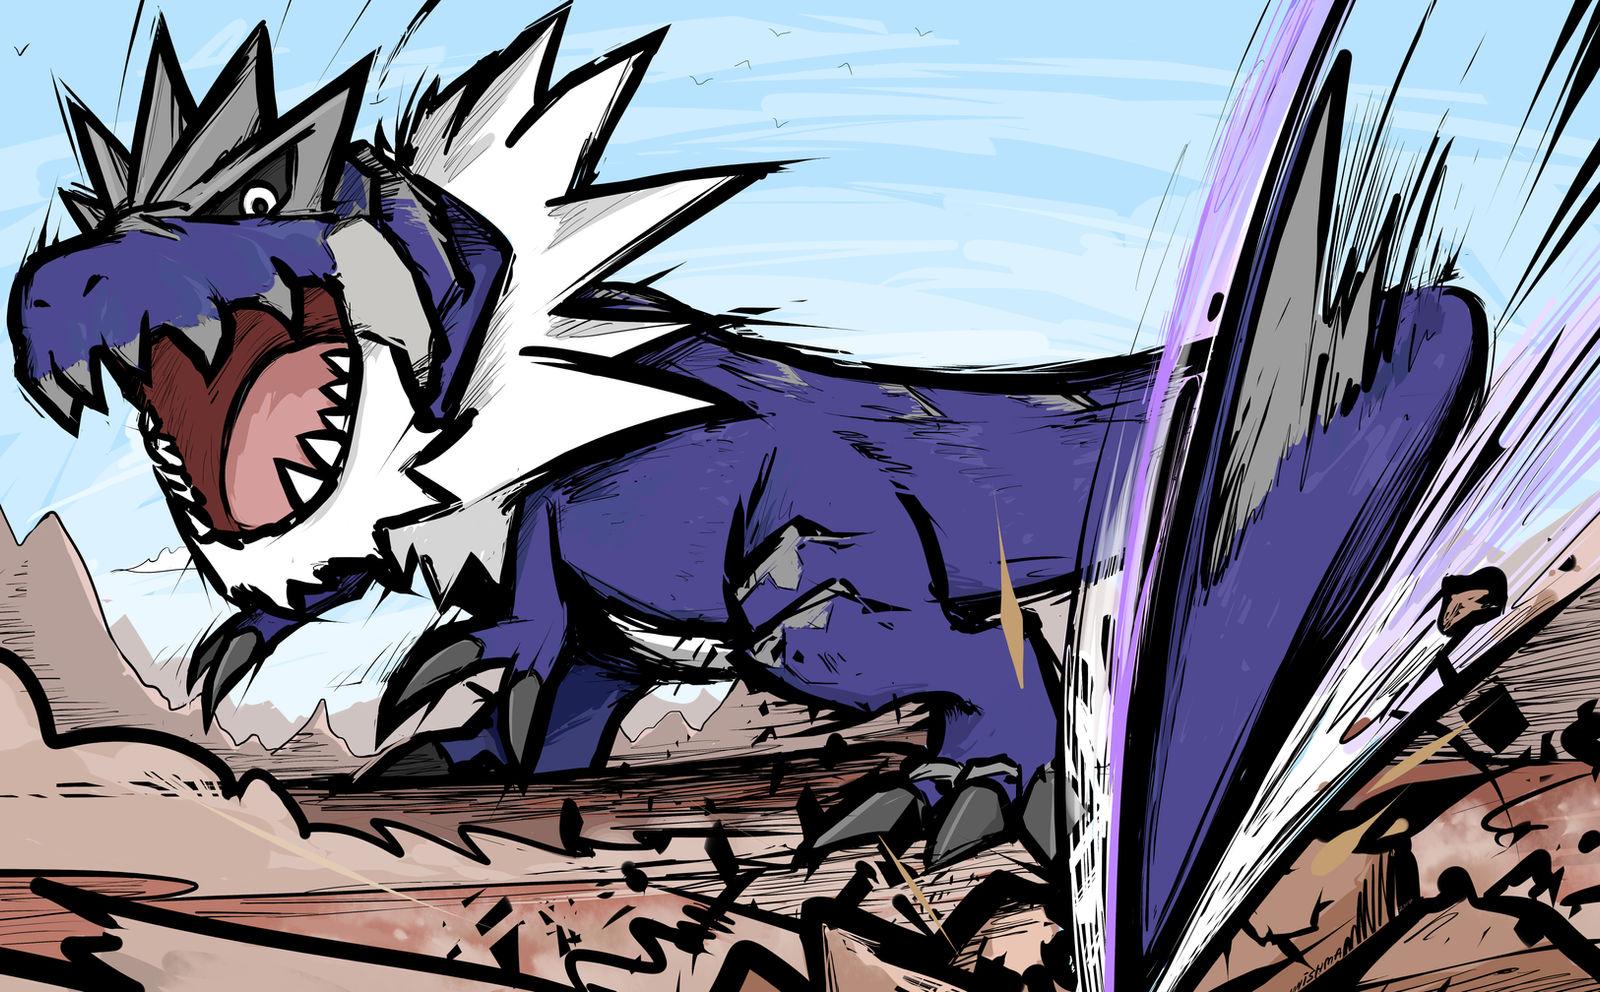 Shiny Tyrantrum Dragon Tail By Ishmam On Deviantart